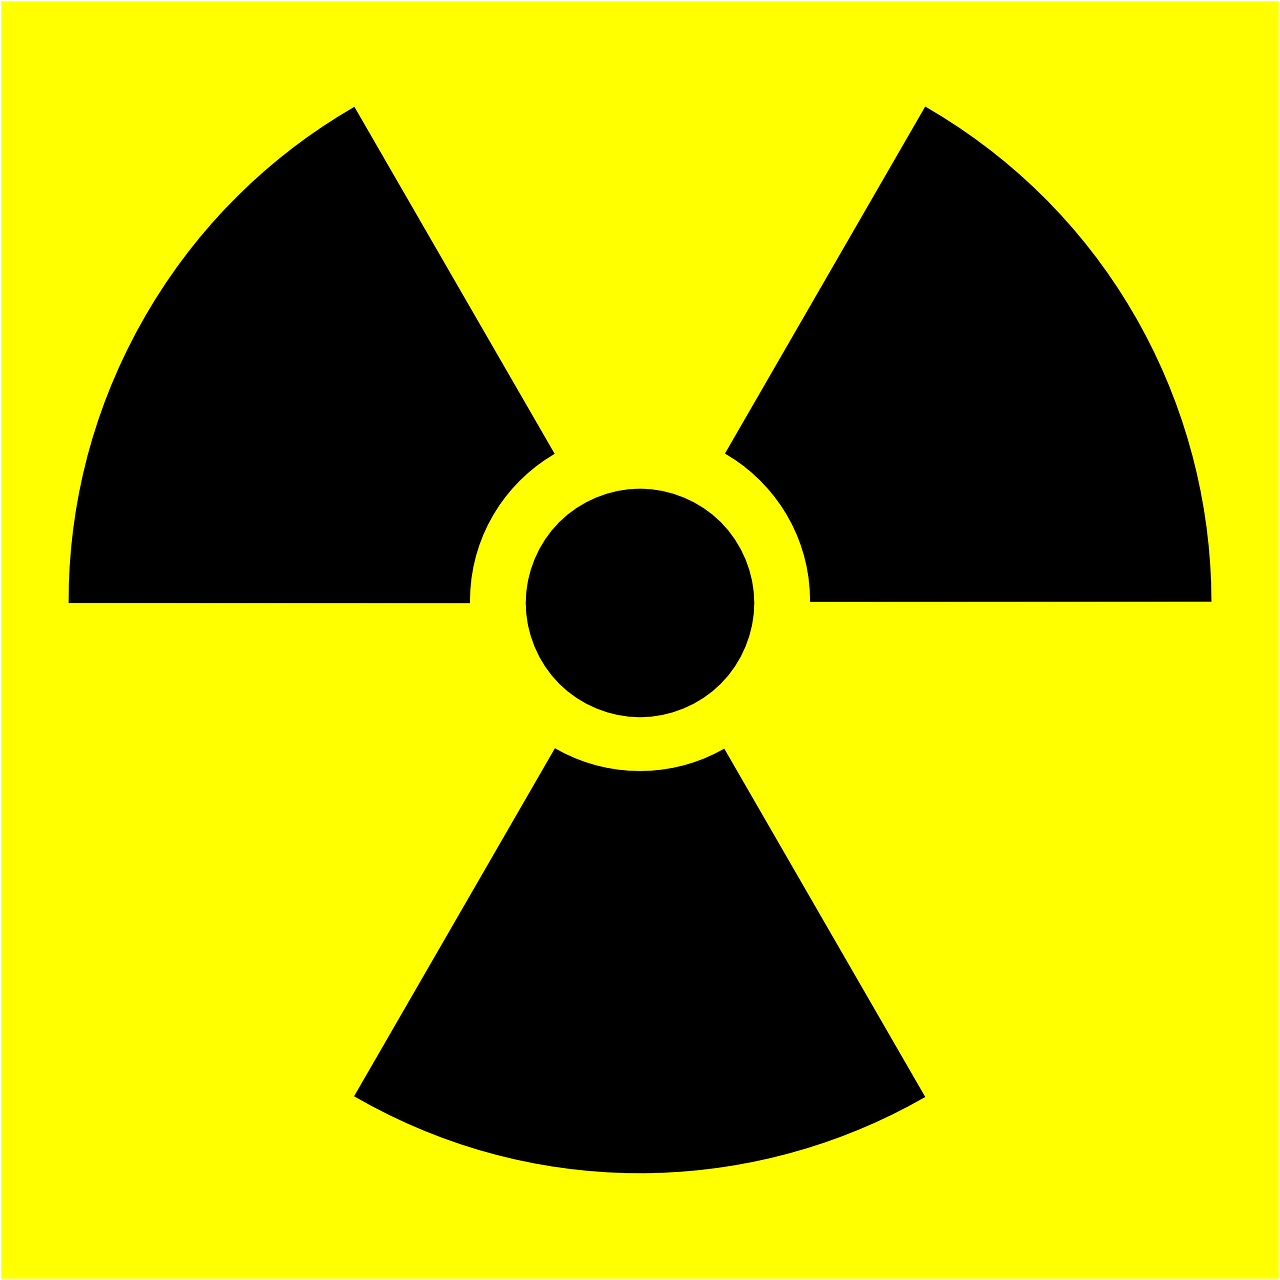 Radioactive, nuclear